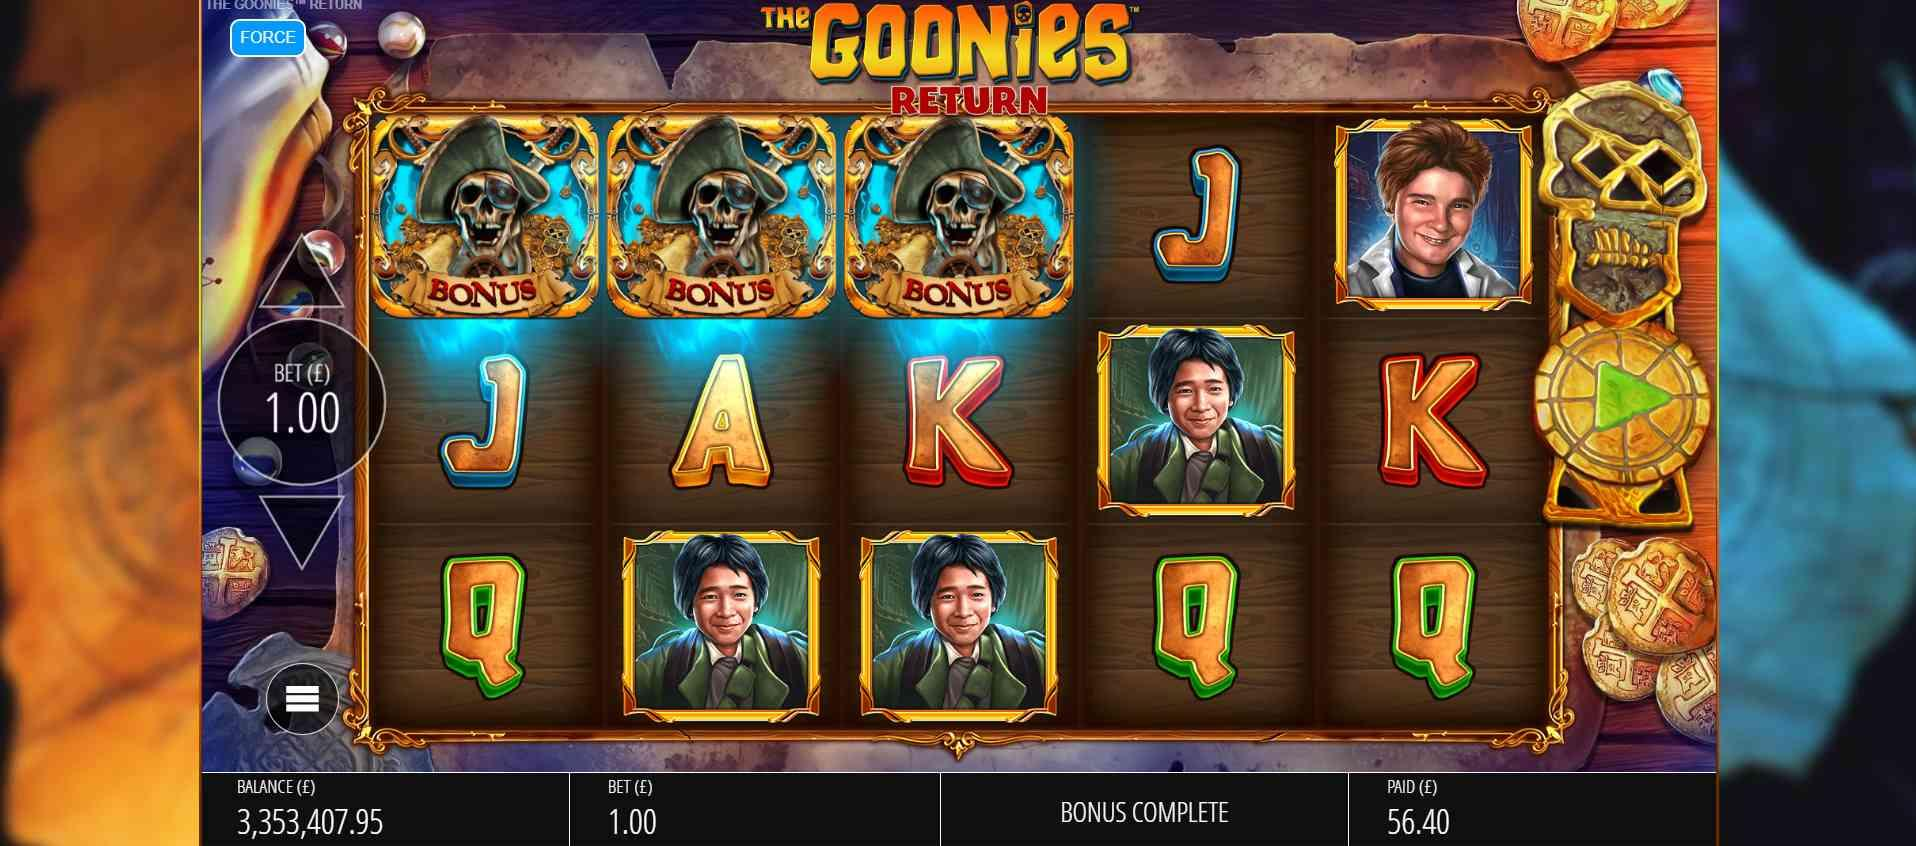 The Goonies Return Slot Review